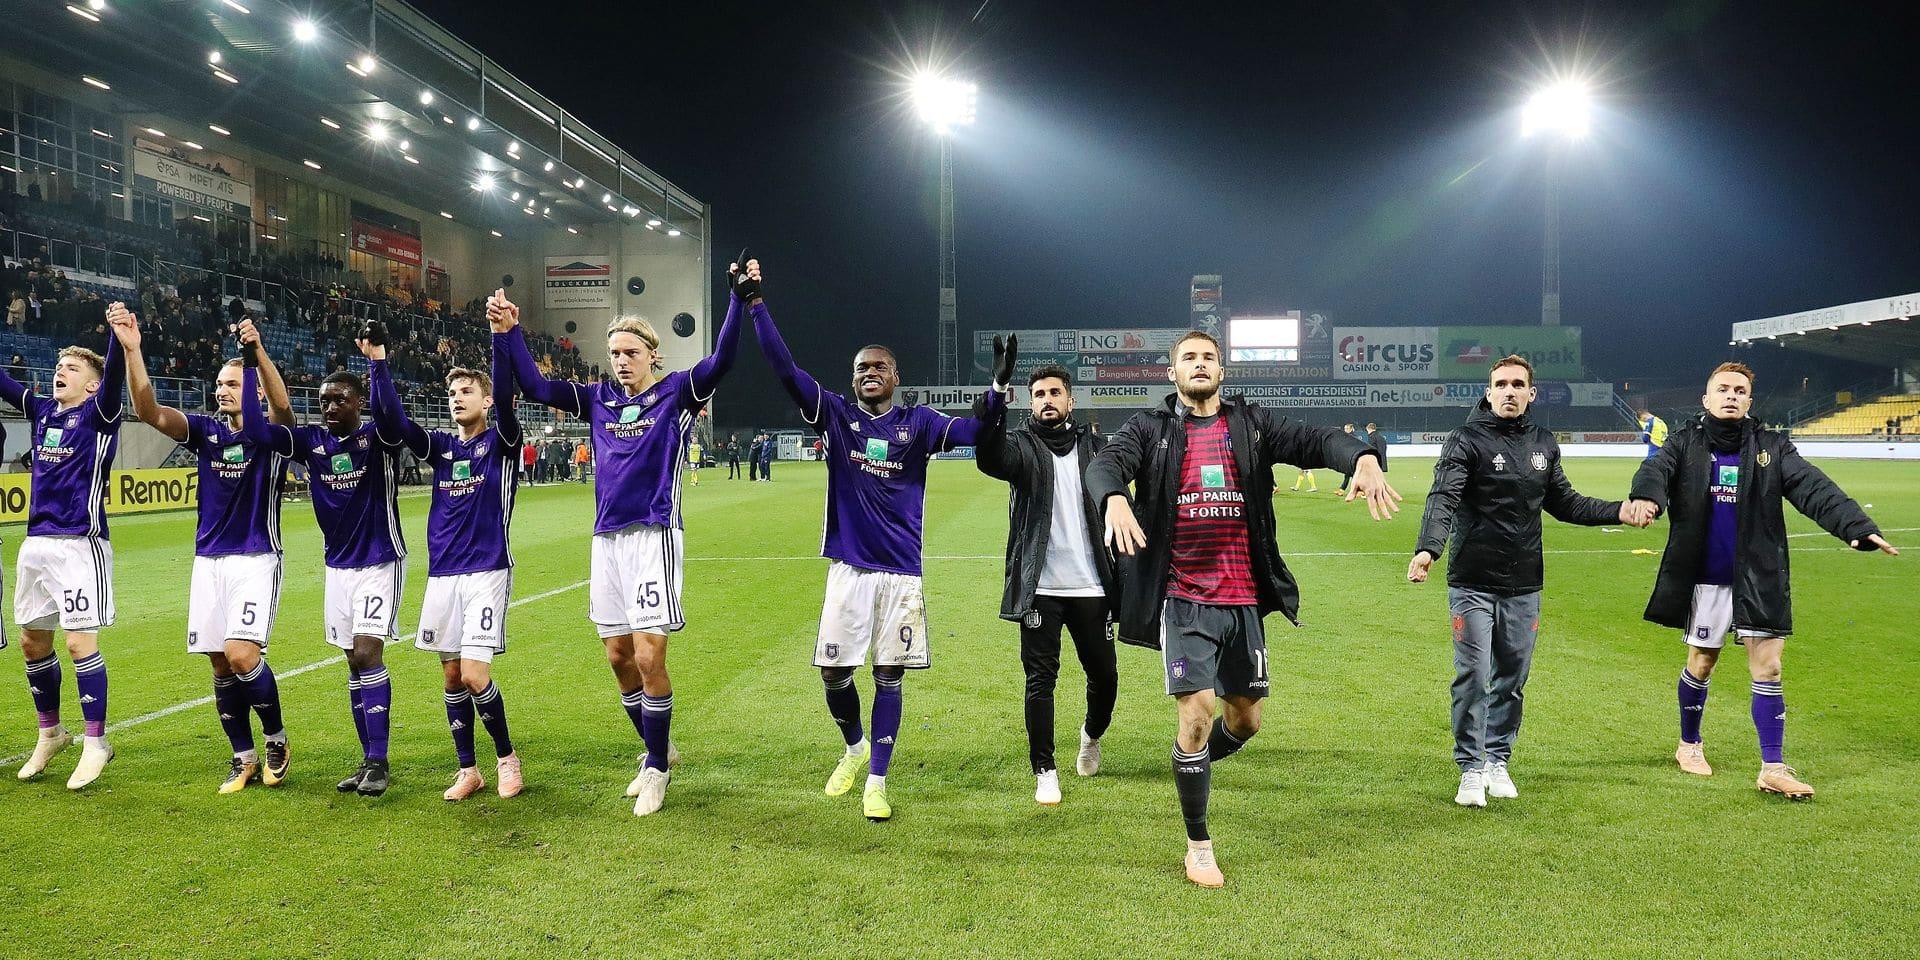 Anderlecht's players celebrate after winning the soccer match between Waasland-Beveren and RSCA Anderlecht, Sunday 04 November 2018 in Beveren-Waas, on the 14th day of the 'Jupiler Pro League' Belgian soccer championship season 2018-2019. BELGA PHOTO VIRGINIE LEFOUR